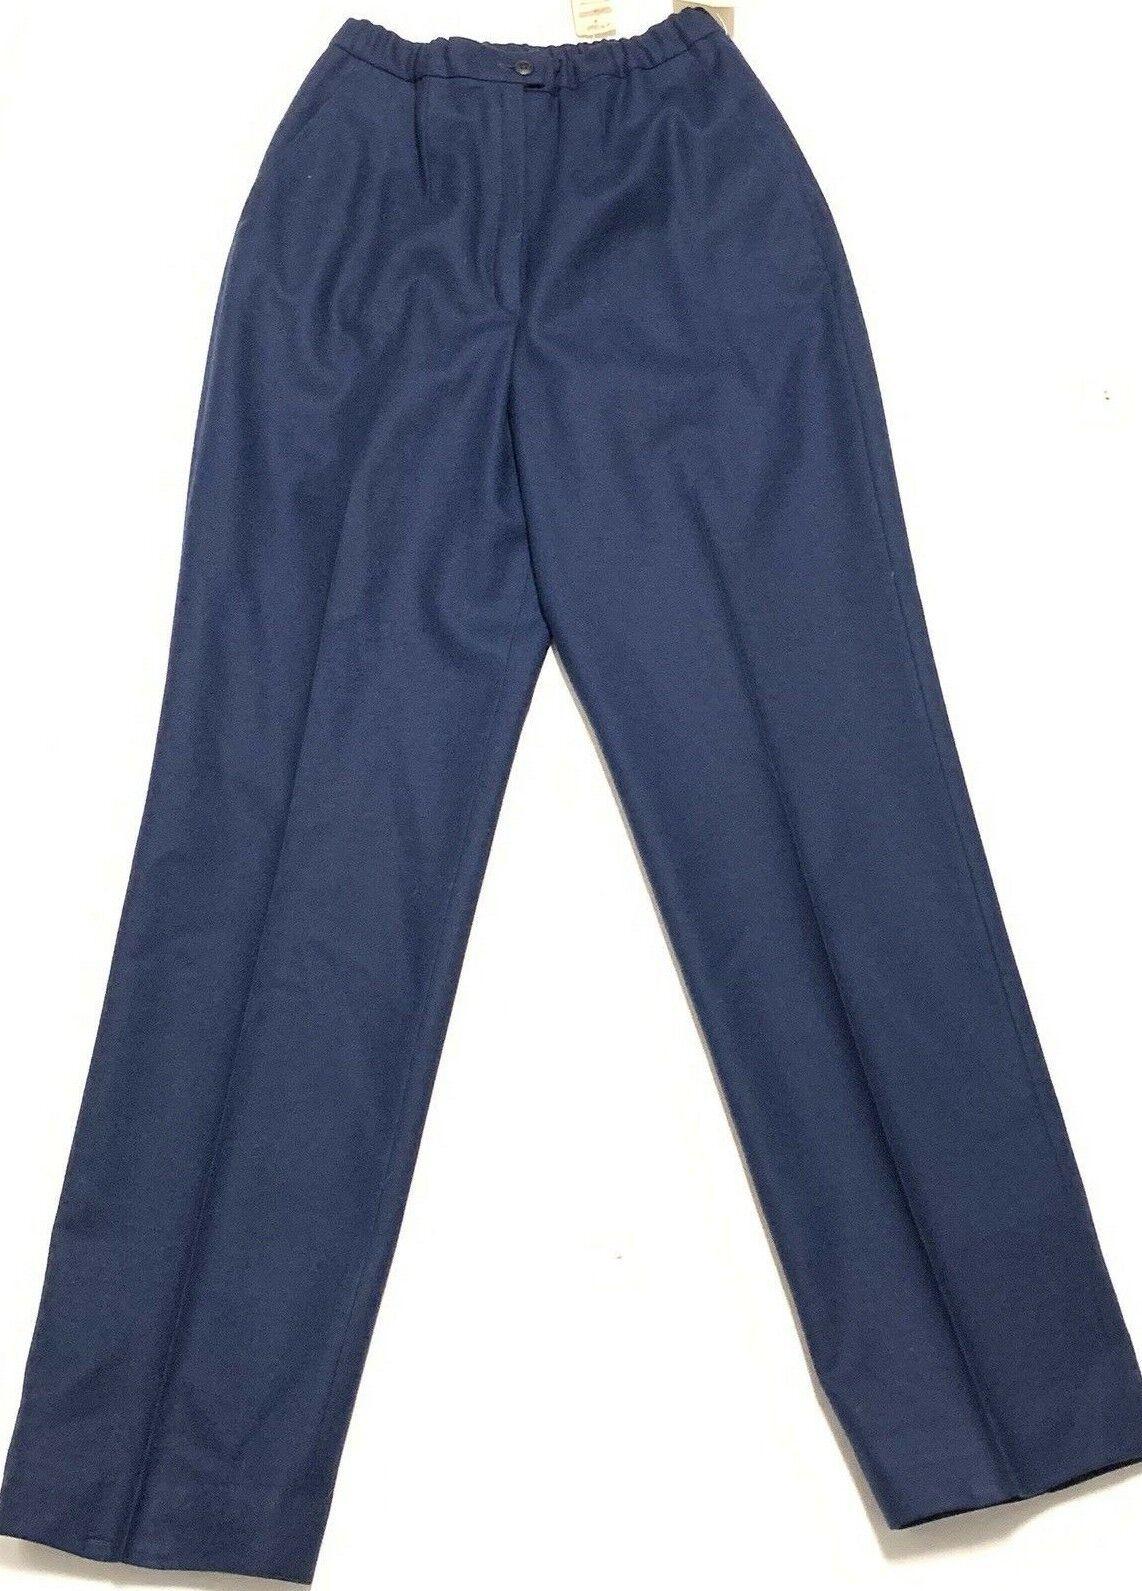 VTG Pendleton Womens Wool Pants Size 6 NWT bluee High Waist